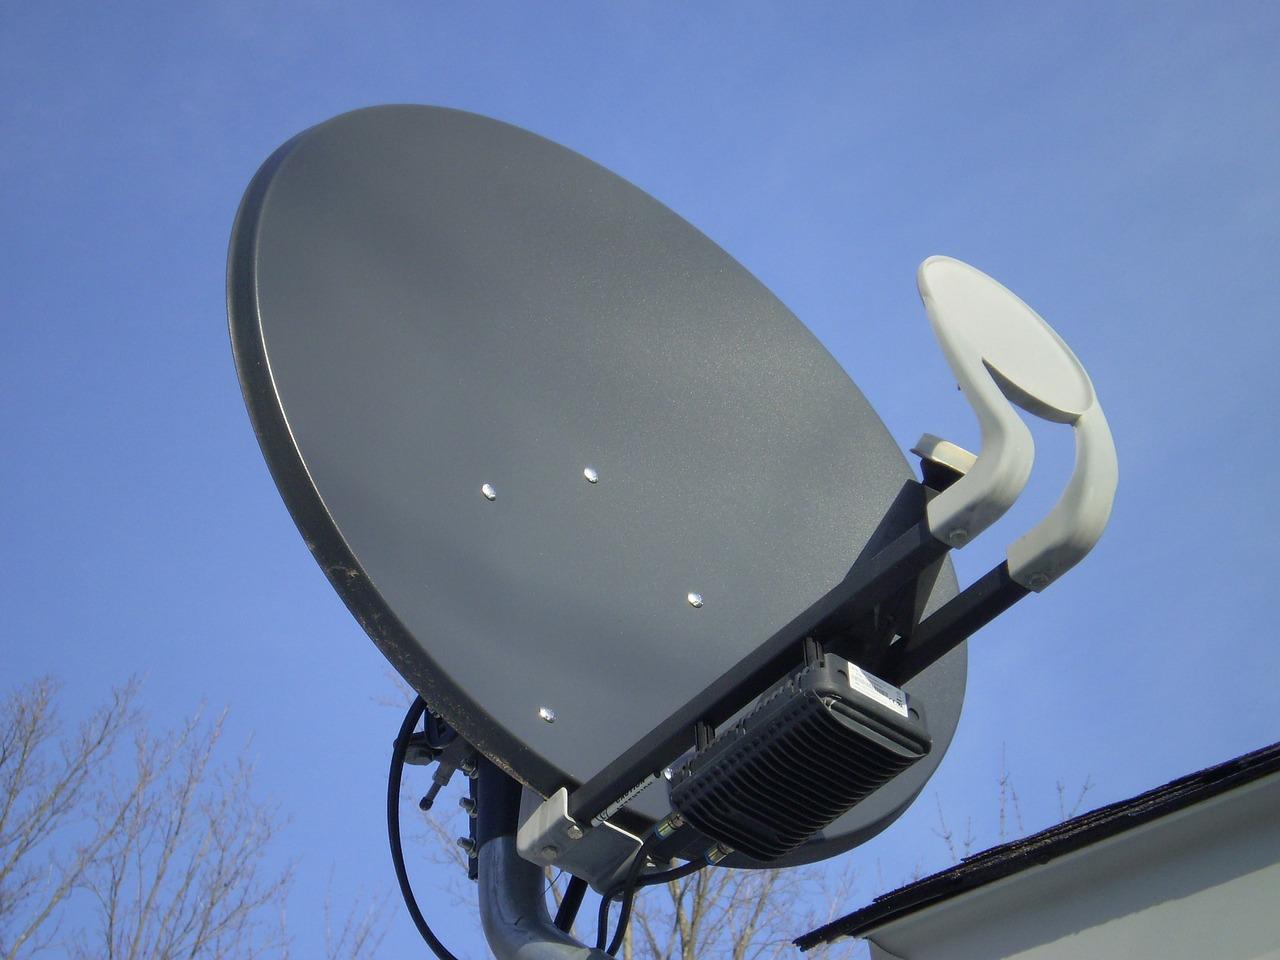 satellite-70409_1280.jpg